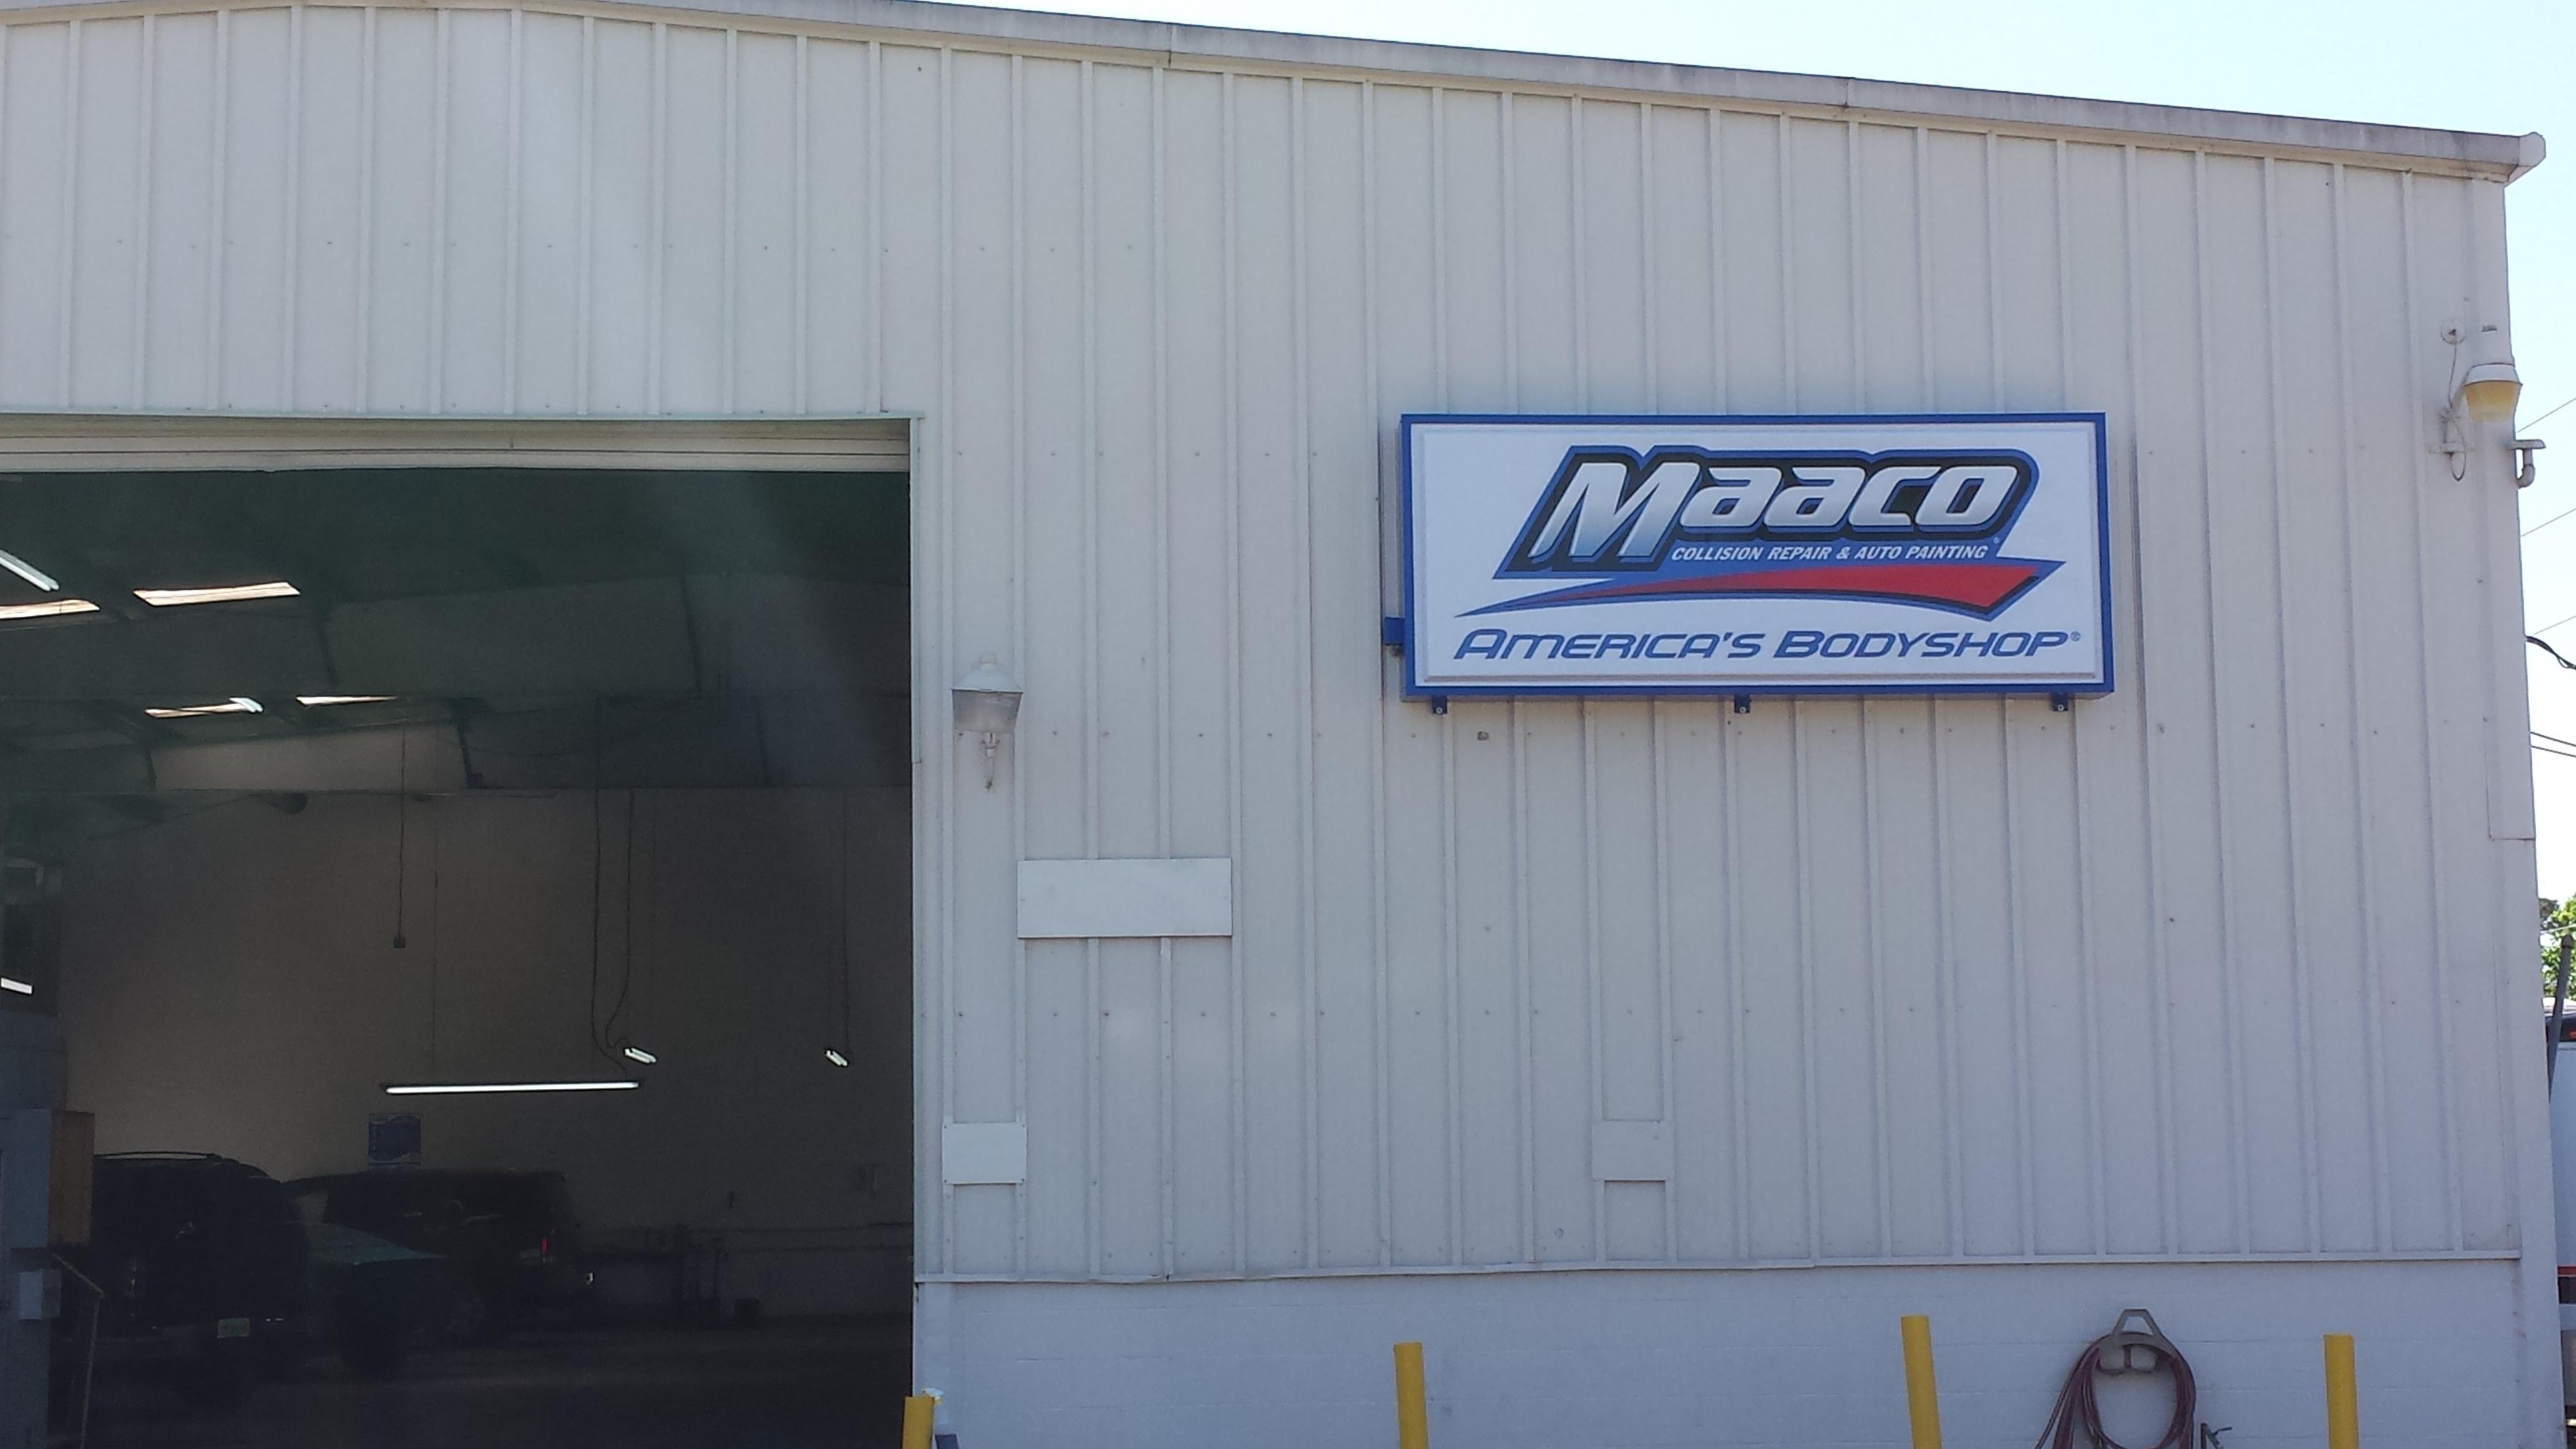 Maaco Collision Repair & Auto Painting image 0